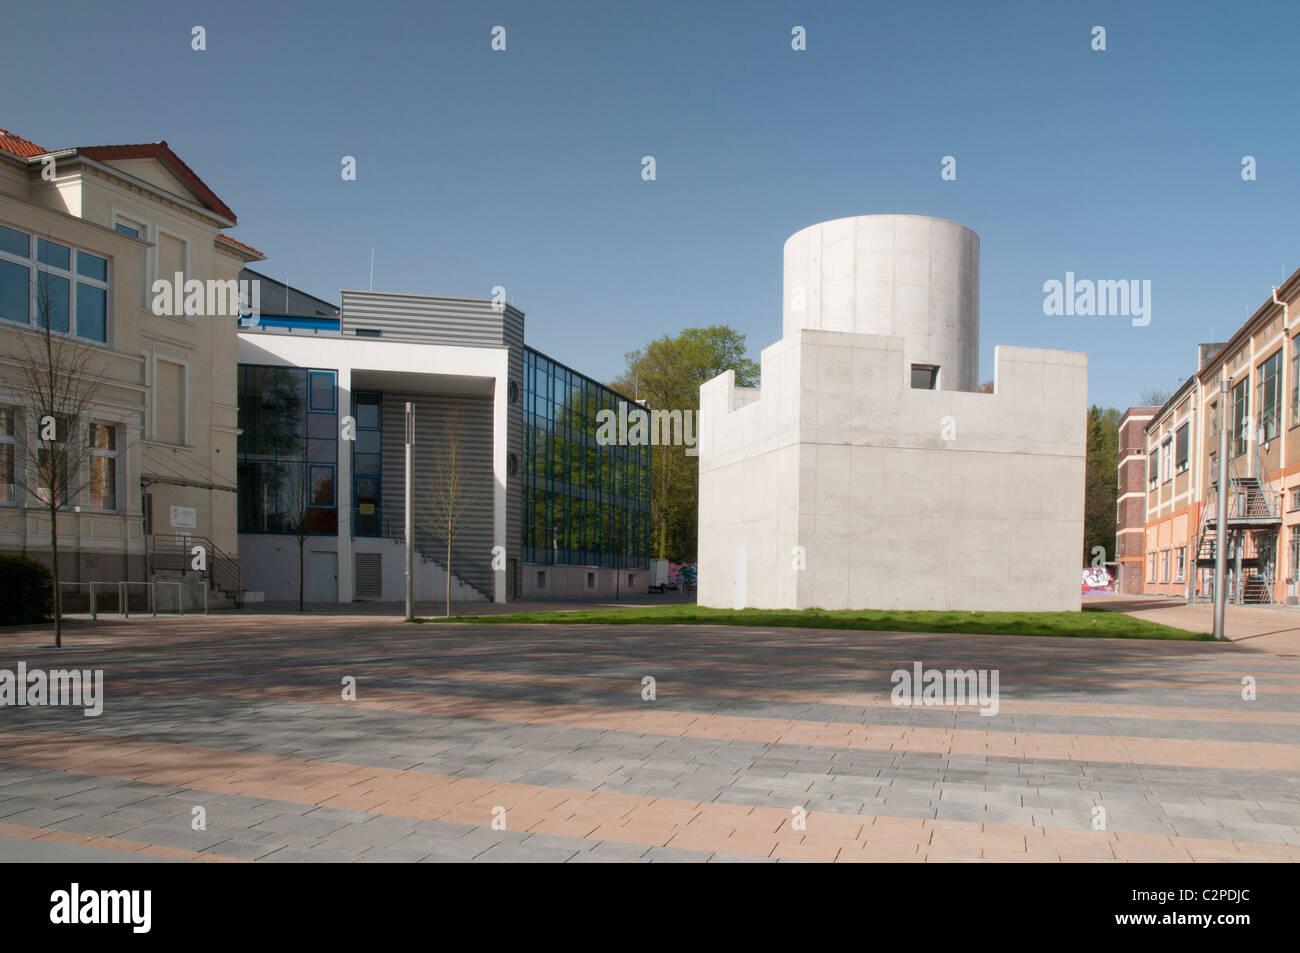 Centre for International Light/Illumination Art, Facade of the Skyspace , James Turrell, Unna, North Rhine-Westphalia, - Stock Image